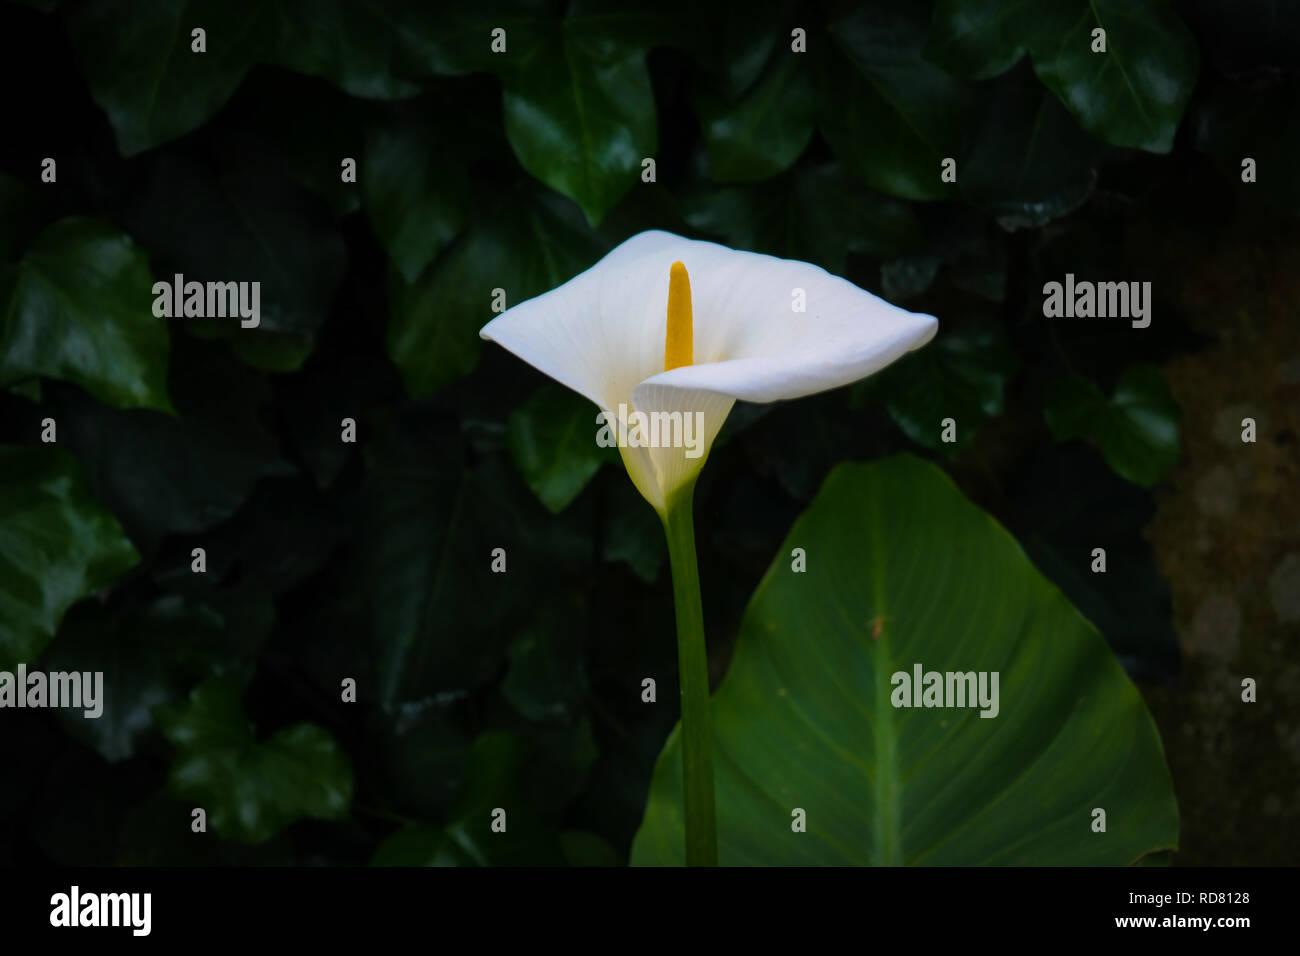 Lisbon, Arum Lily - Stock Image